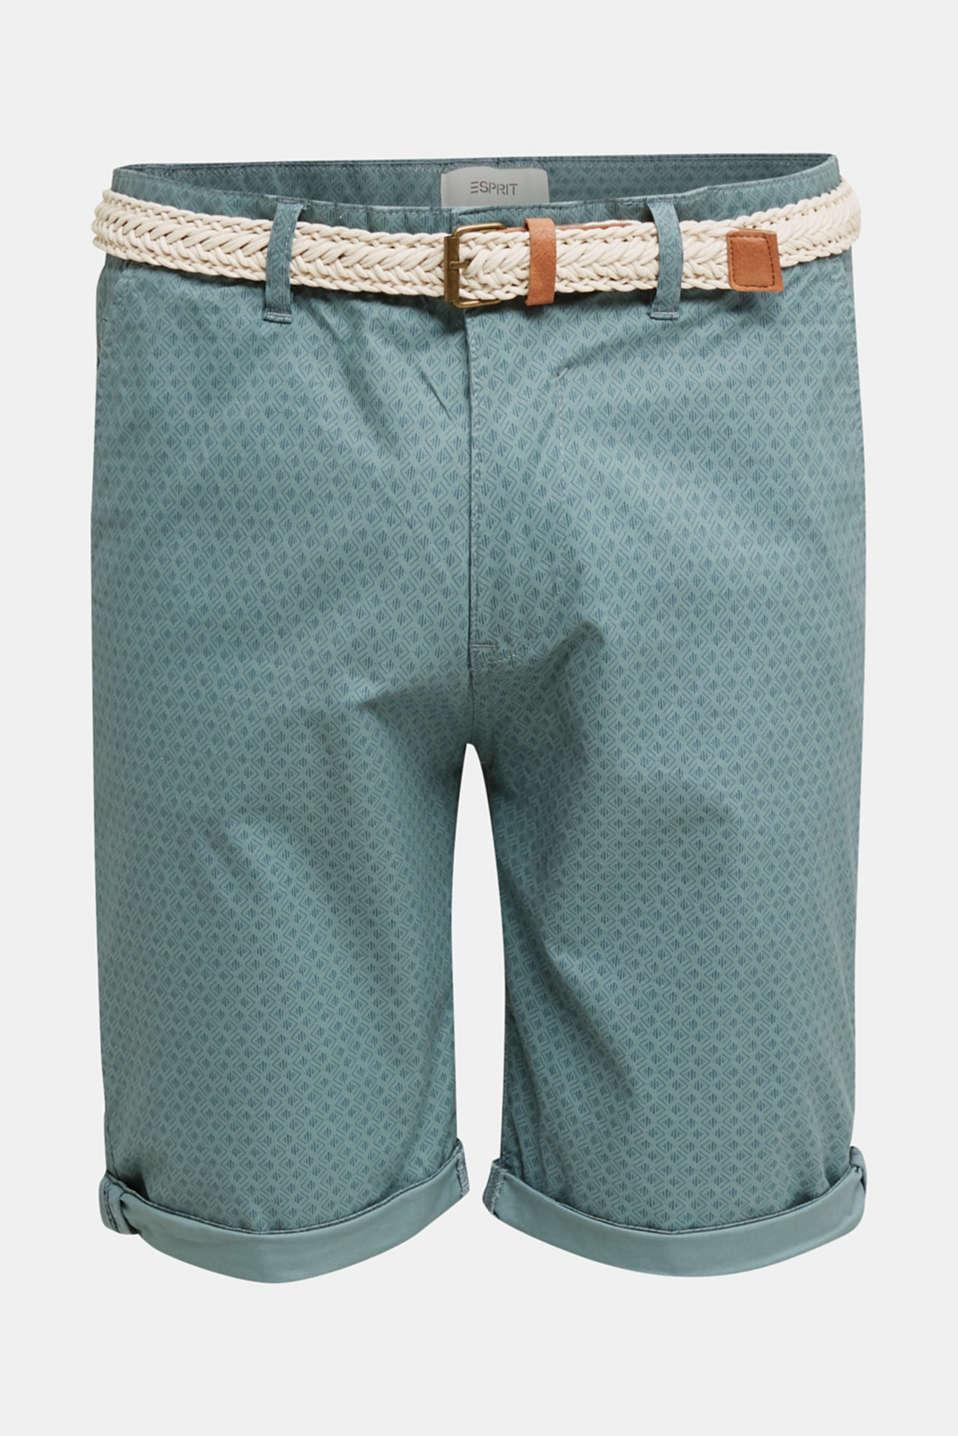 Organic cotton Shorts + belt, TEAL GREEN, detail image number 7